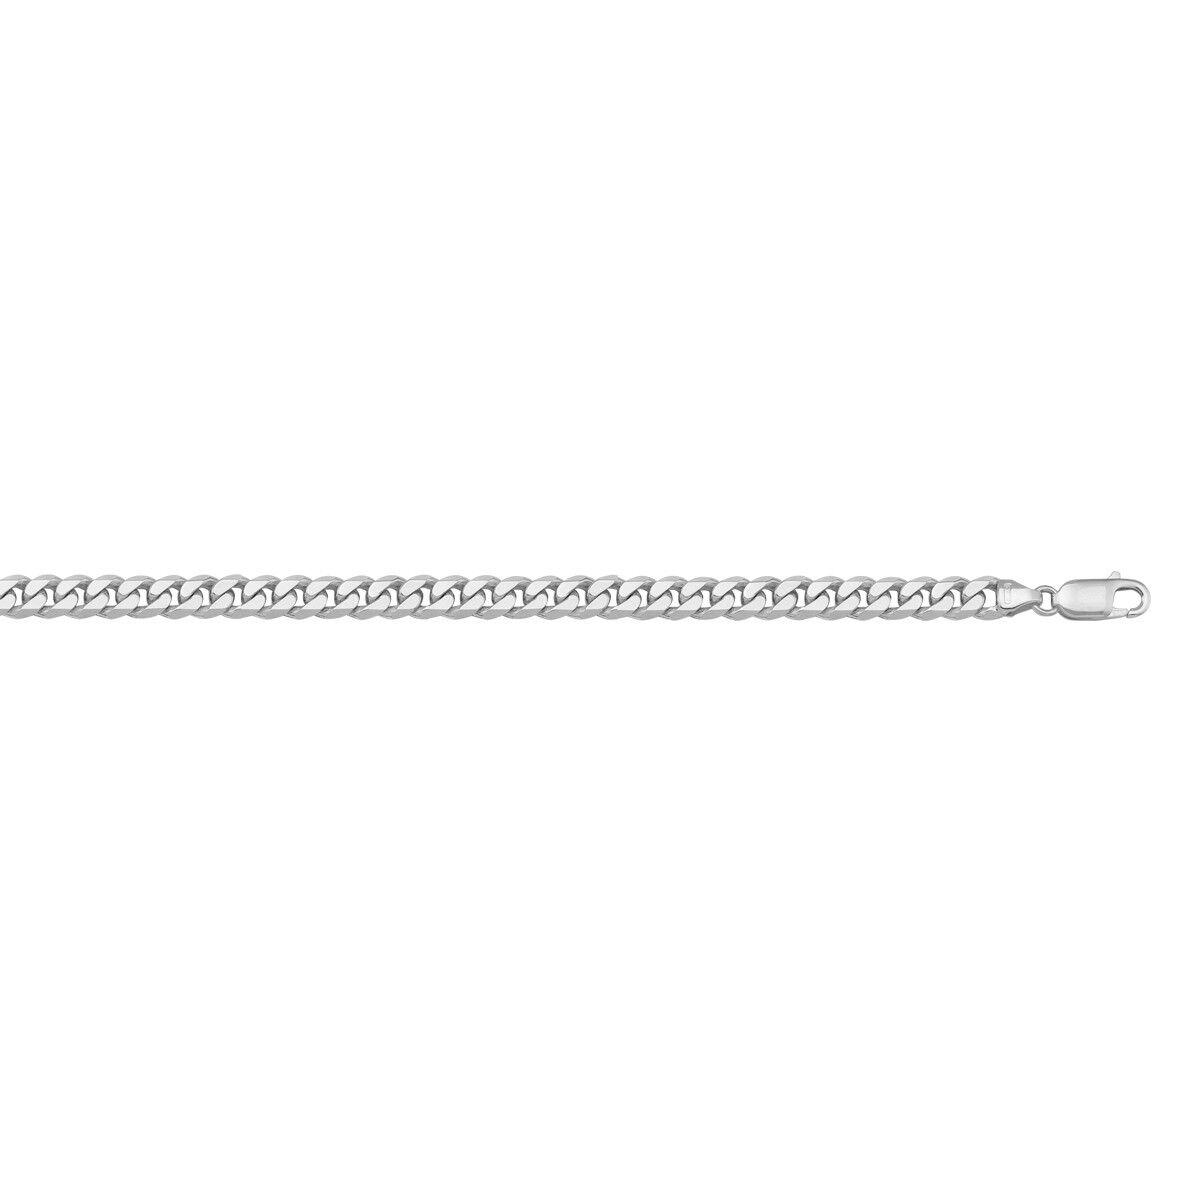 10 - 18K White gold Flat Beveled Link Chain, 3.3mm, Italian Made, NEW,